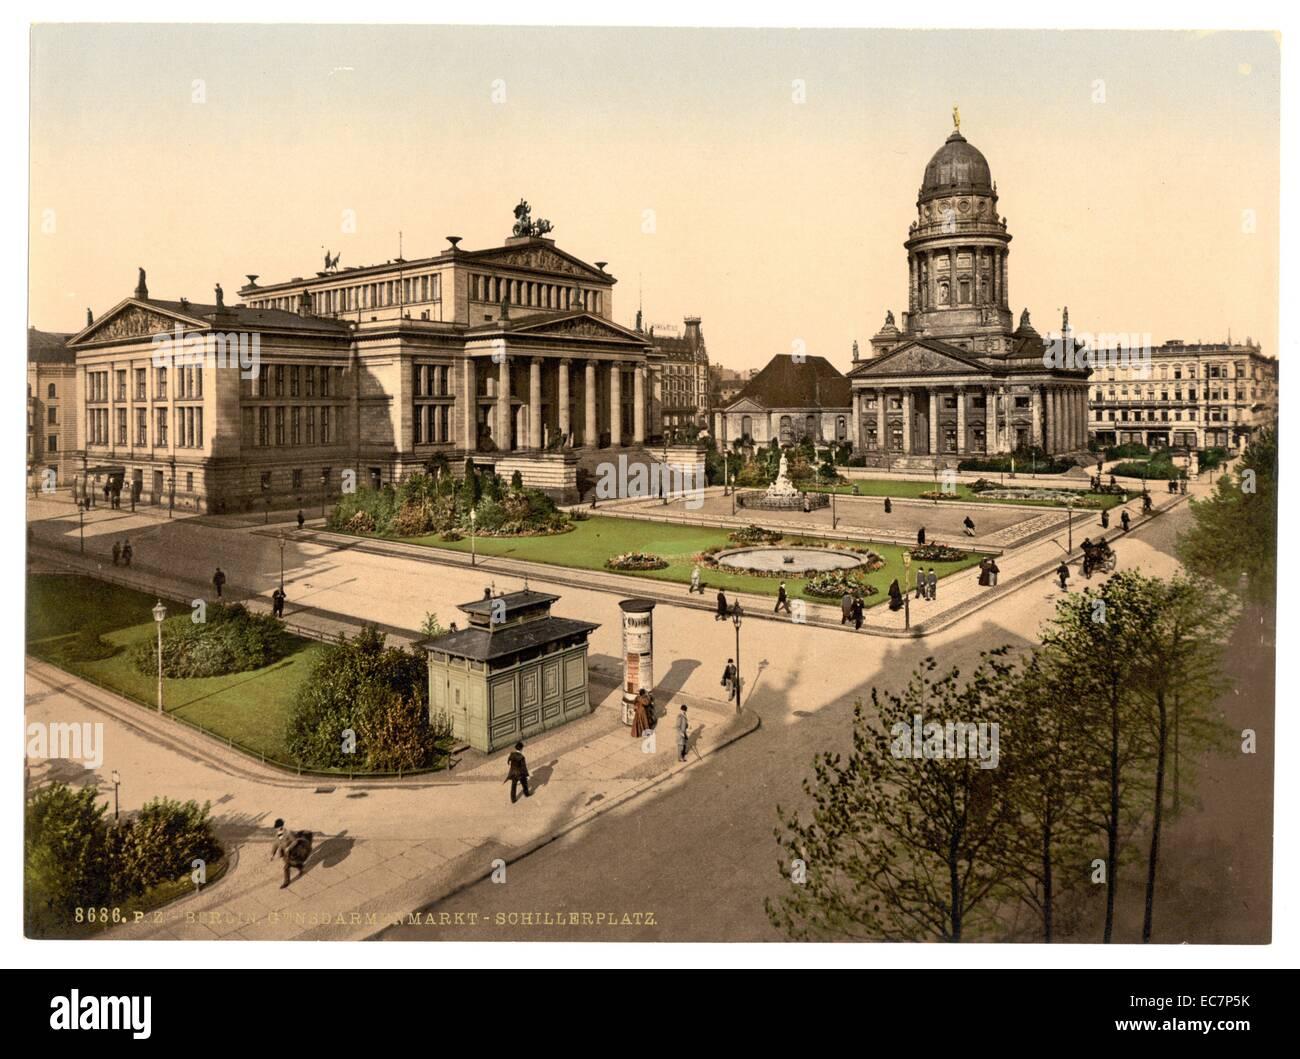 Schiller Square, Berlin, Germany - Stock Image